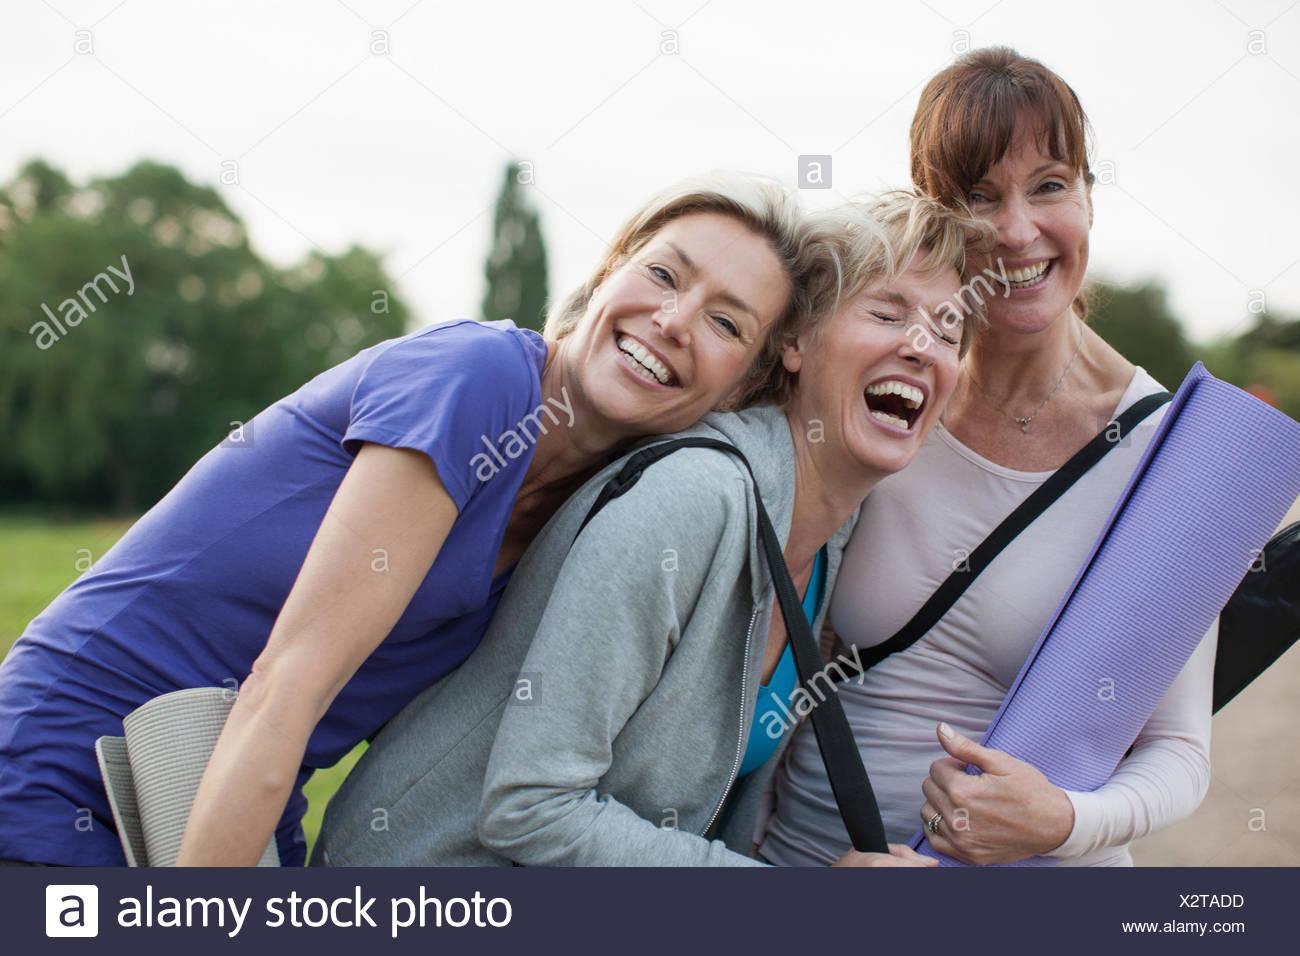 Smiling women holding yoga mats - Stock Image